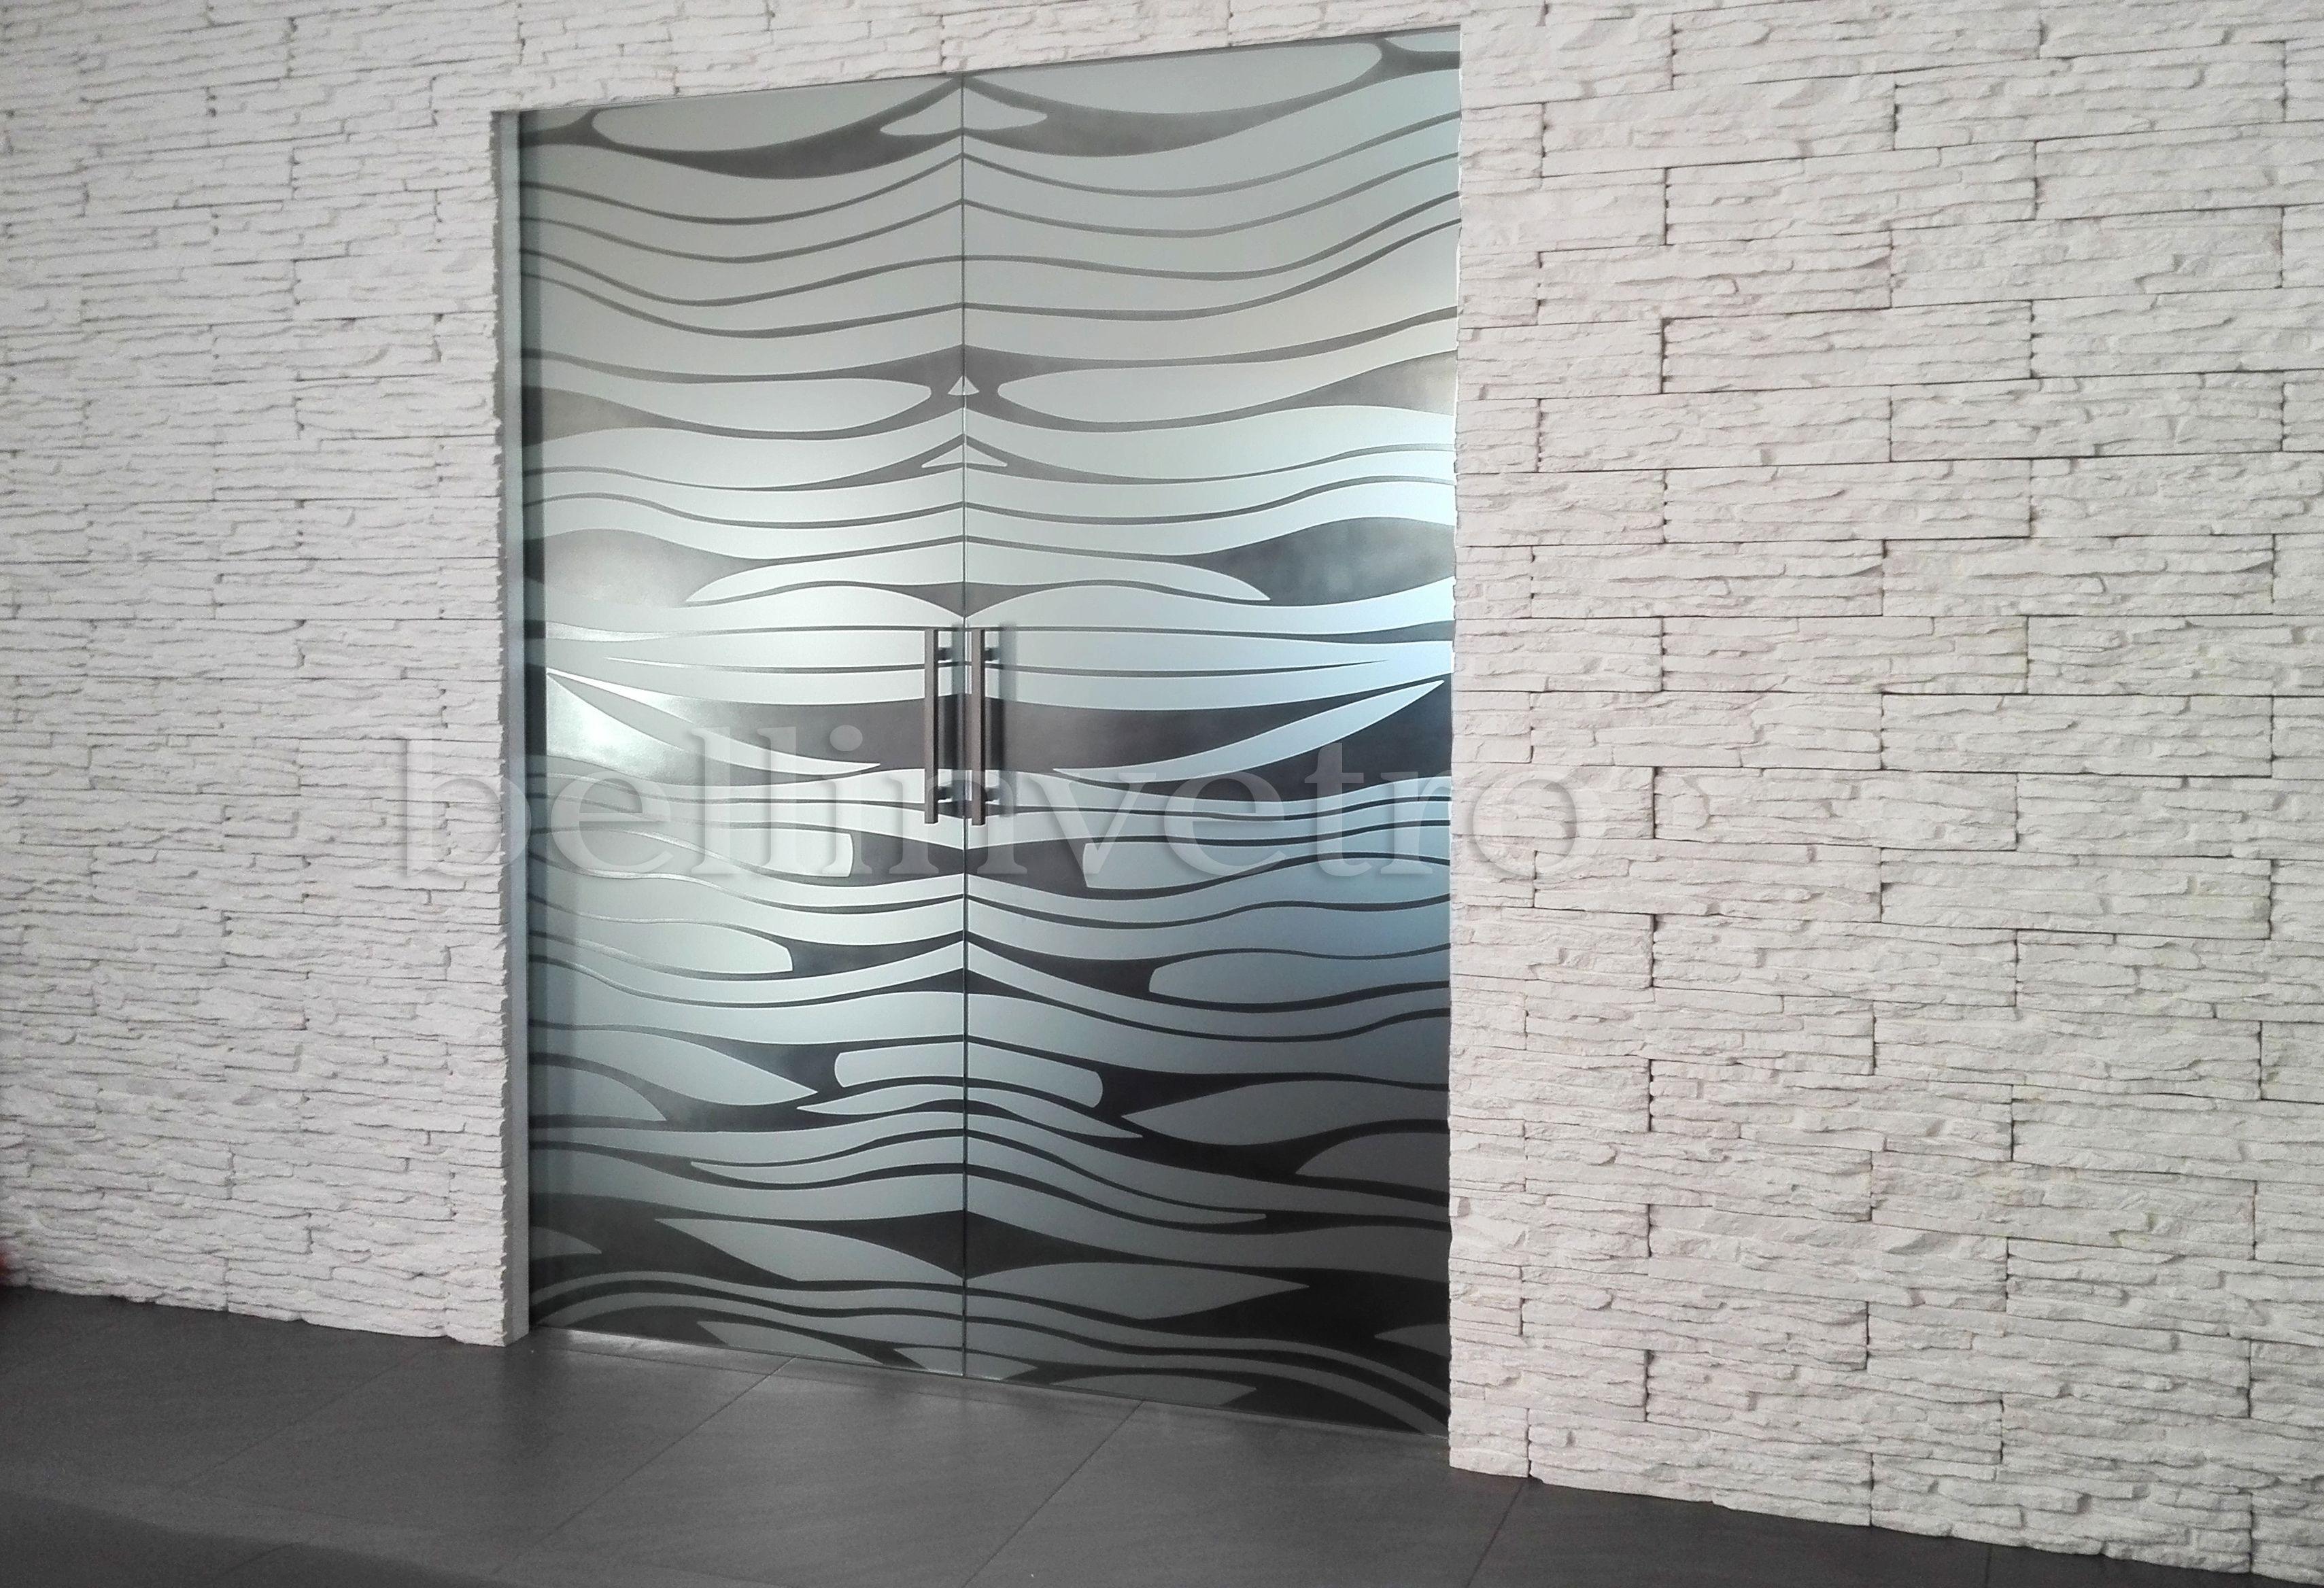 Pin By Joe Moavro On Doors Glass Door Architecture Design Glass